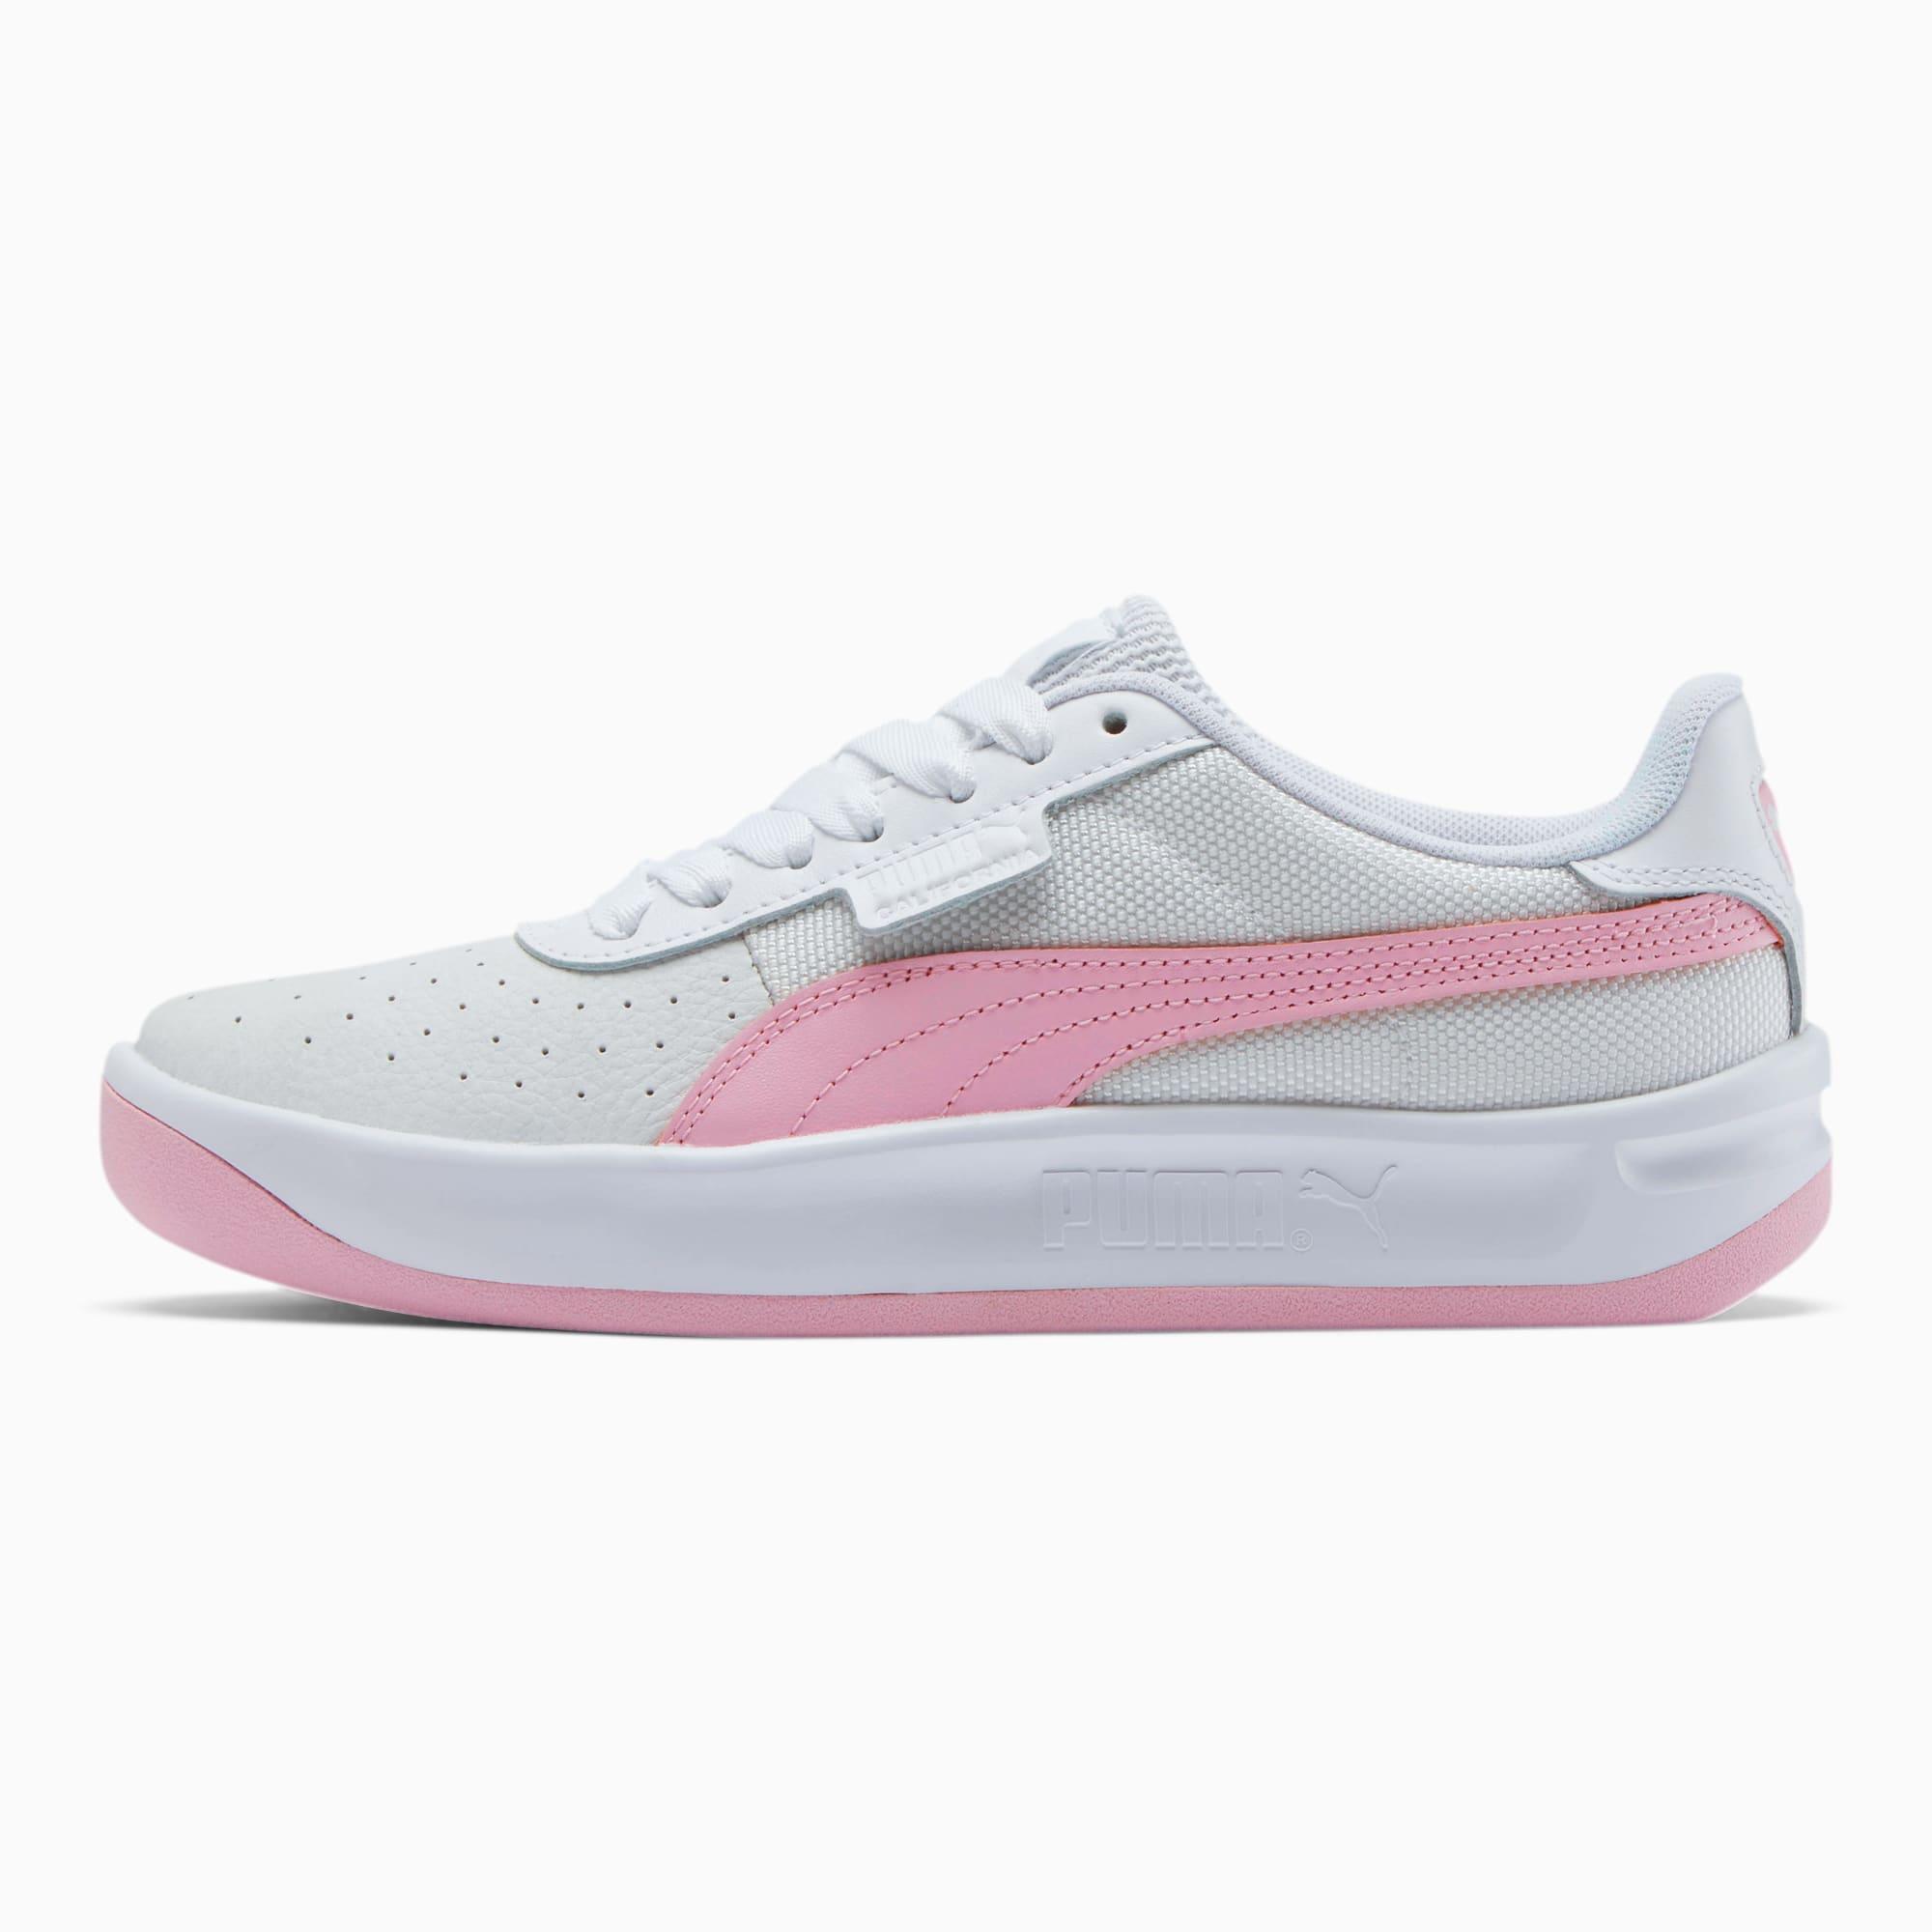 Zapatos deportivos California para mujer